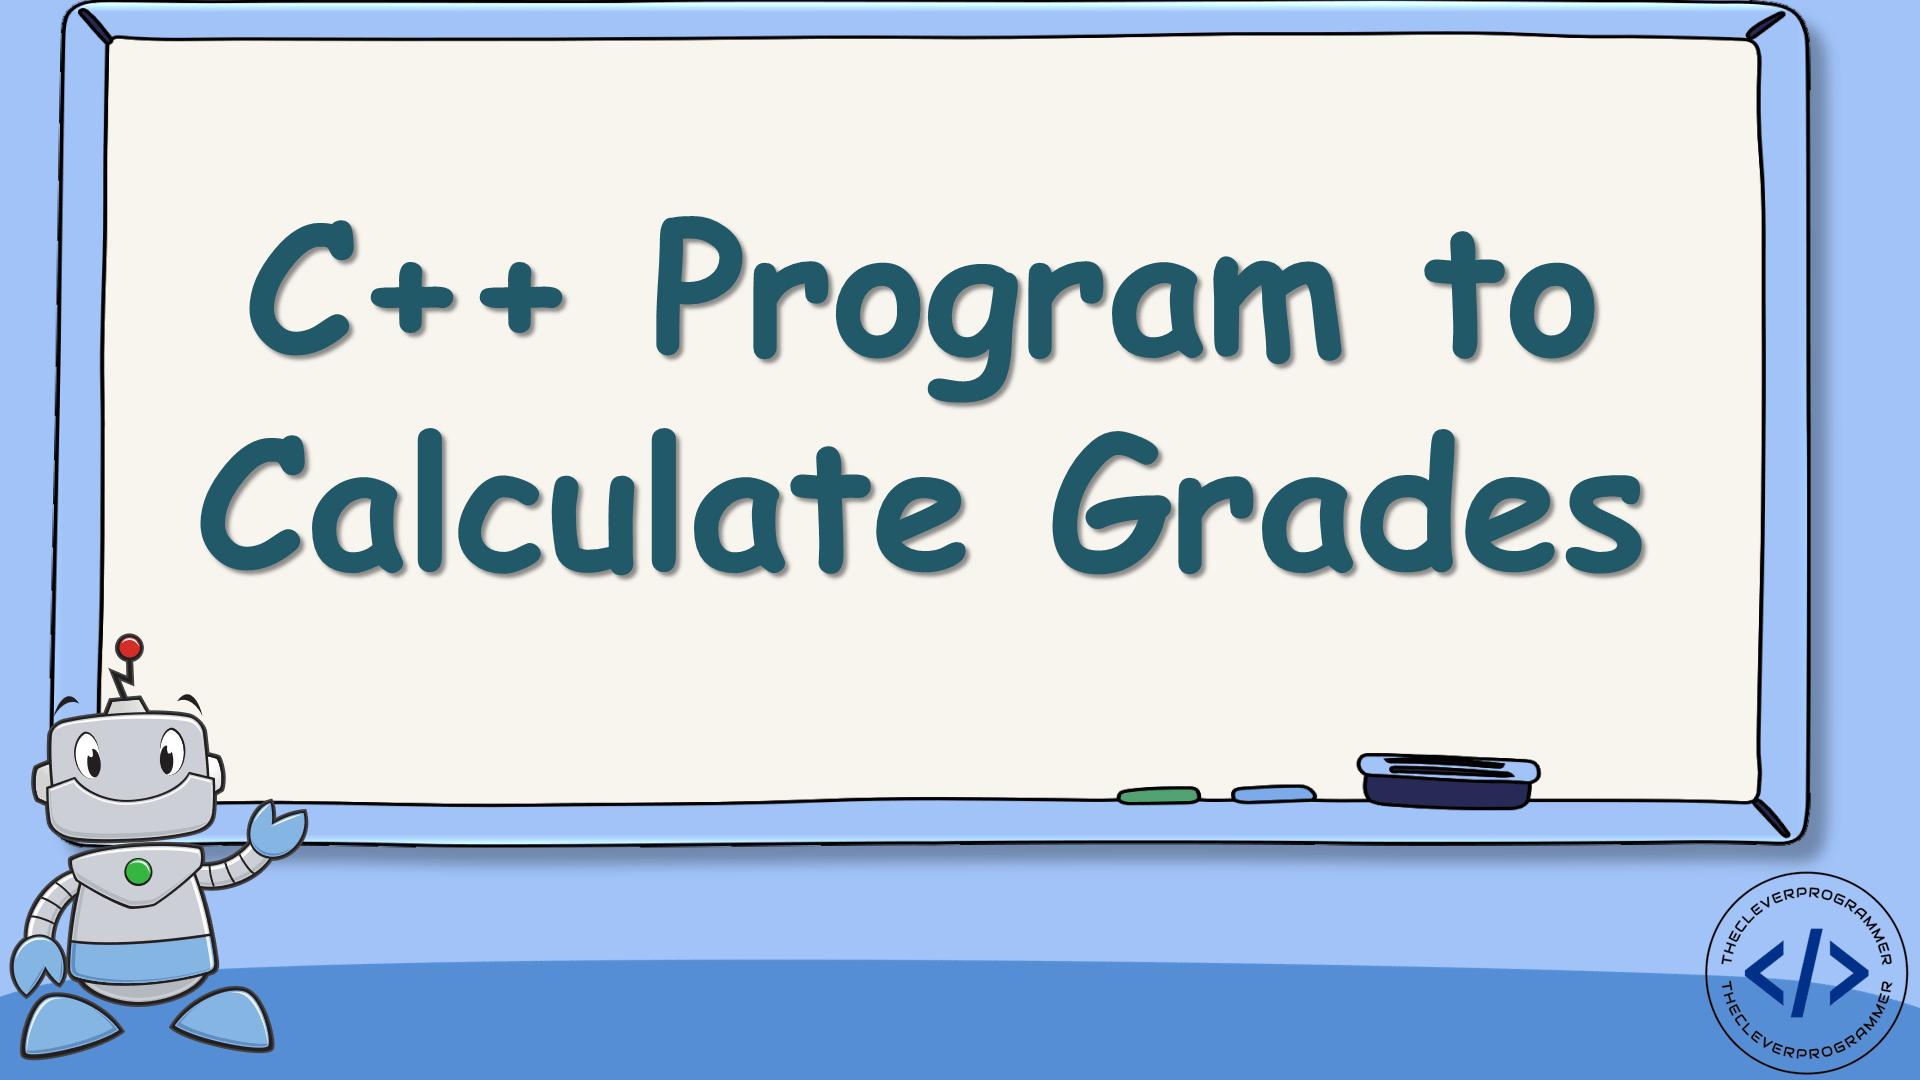 C++ Program to Calculate Grades